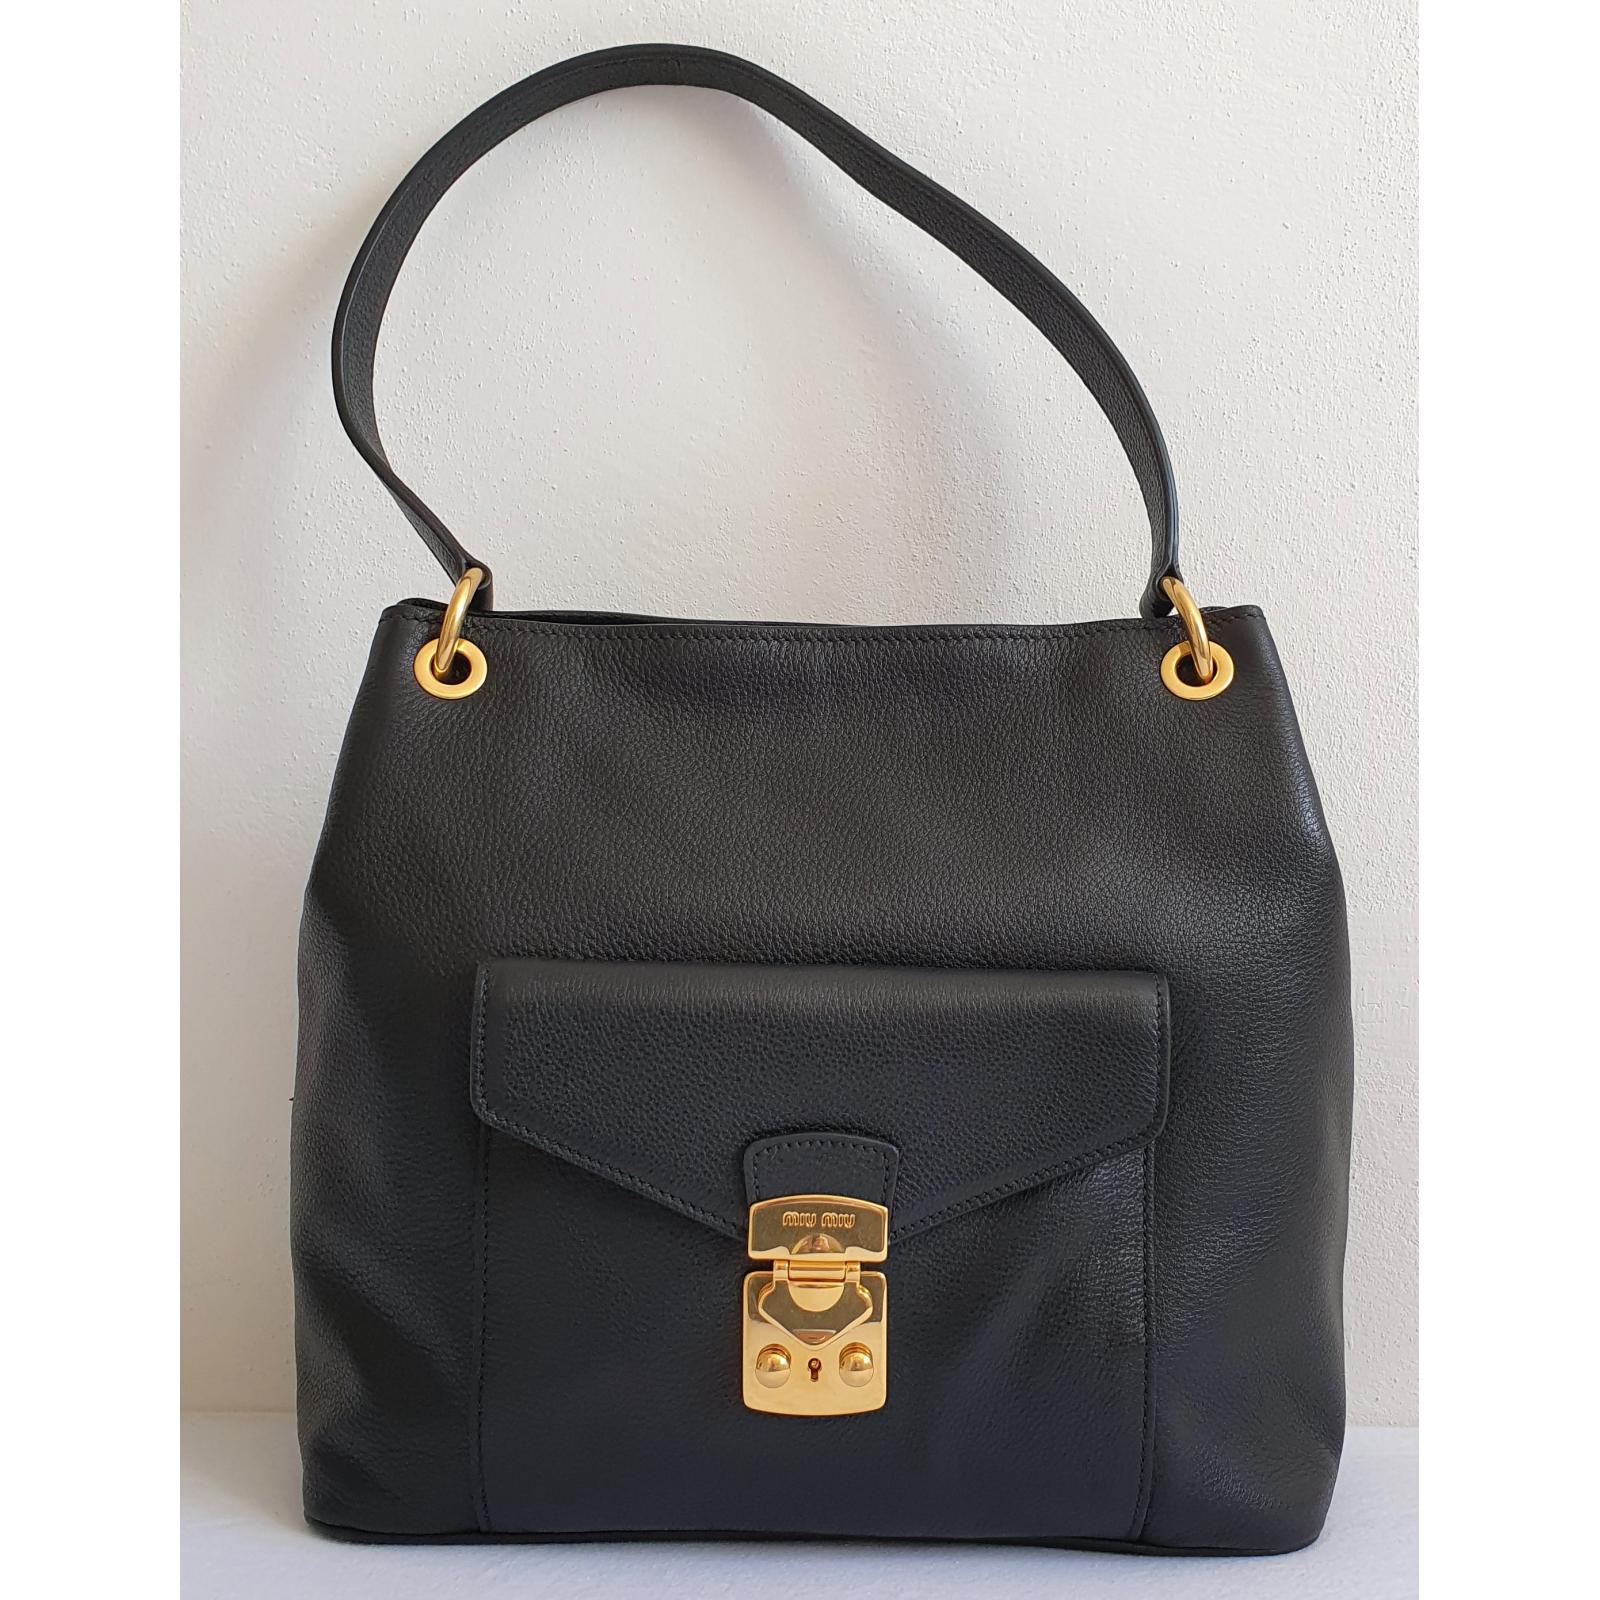 Miu Miu Black Leather Hobo Bag , nowa